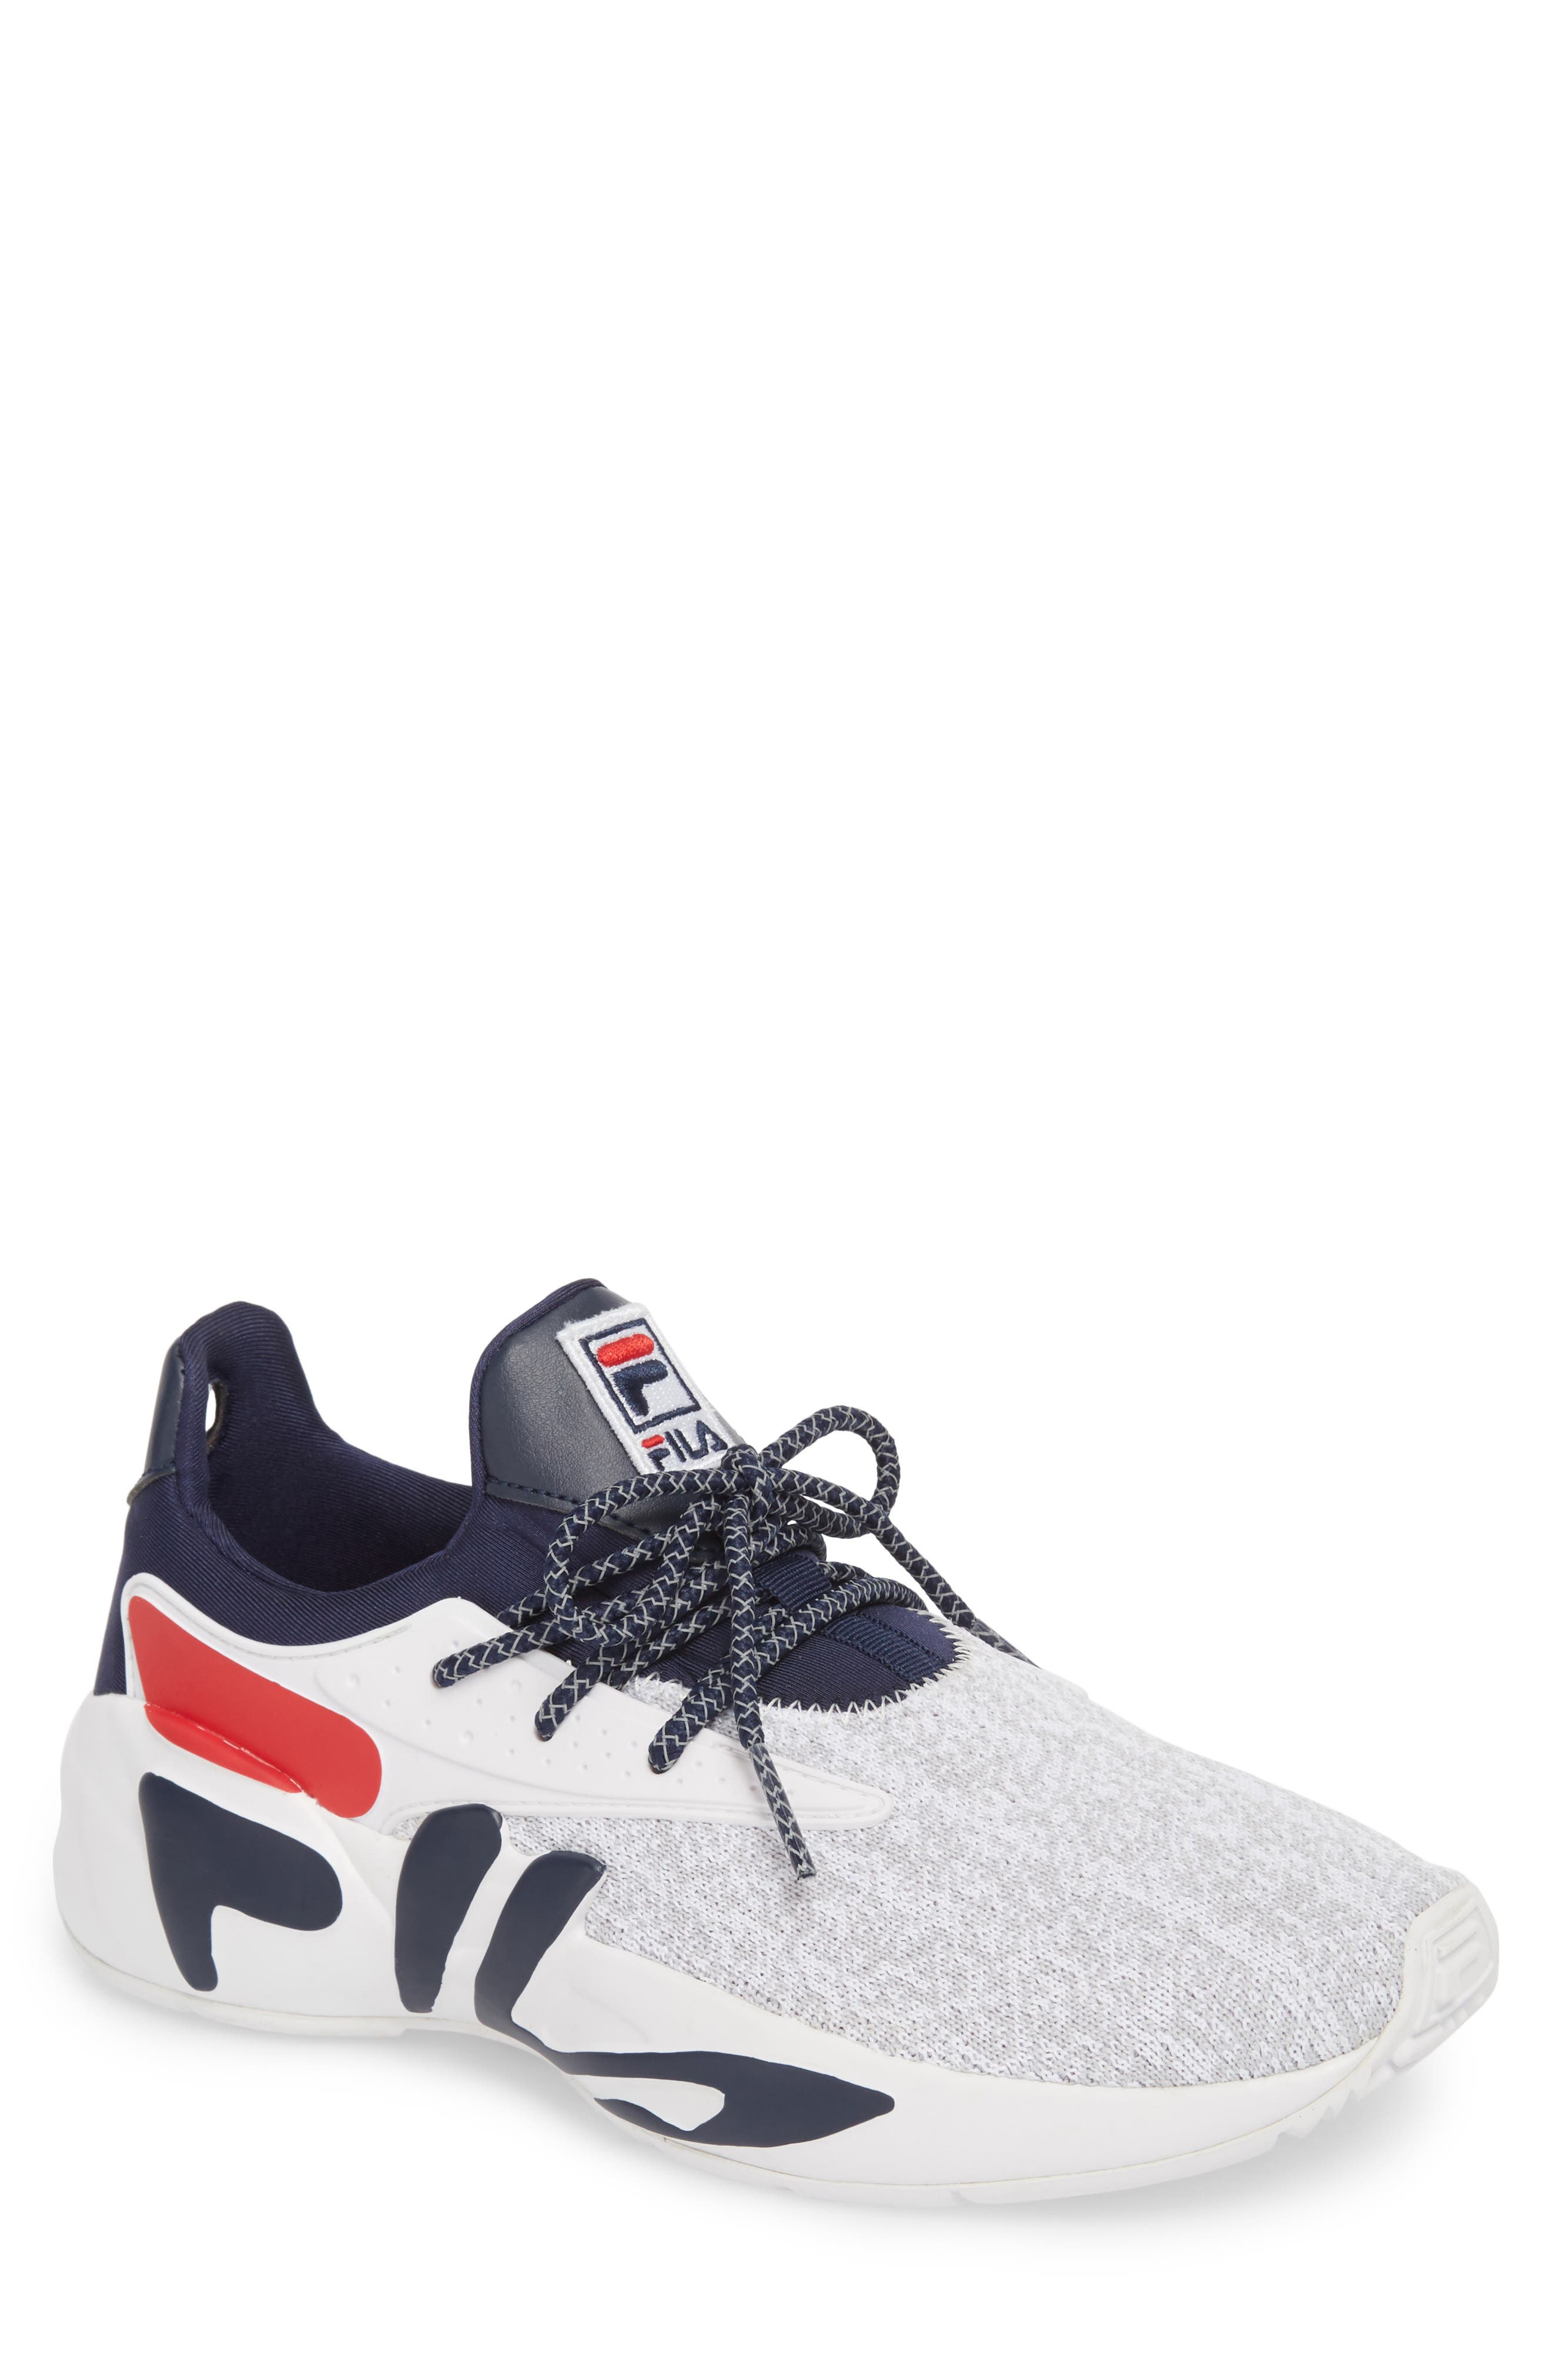 Mindbreaker 2.0 Sneaker,                         Main,                         color, White/ Navy/ Red